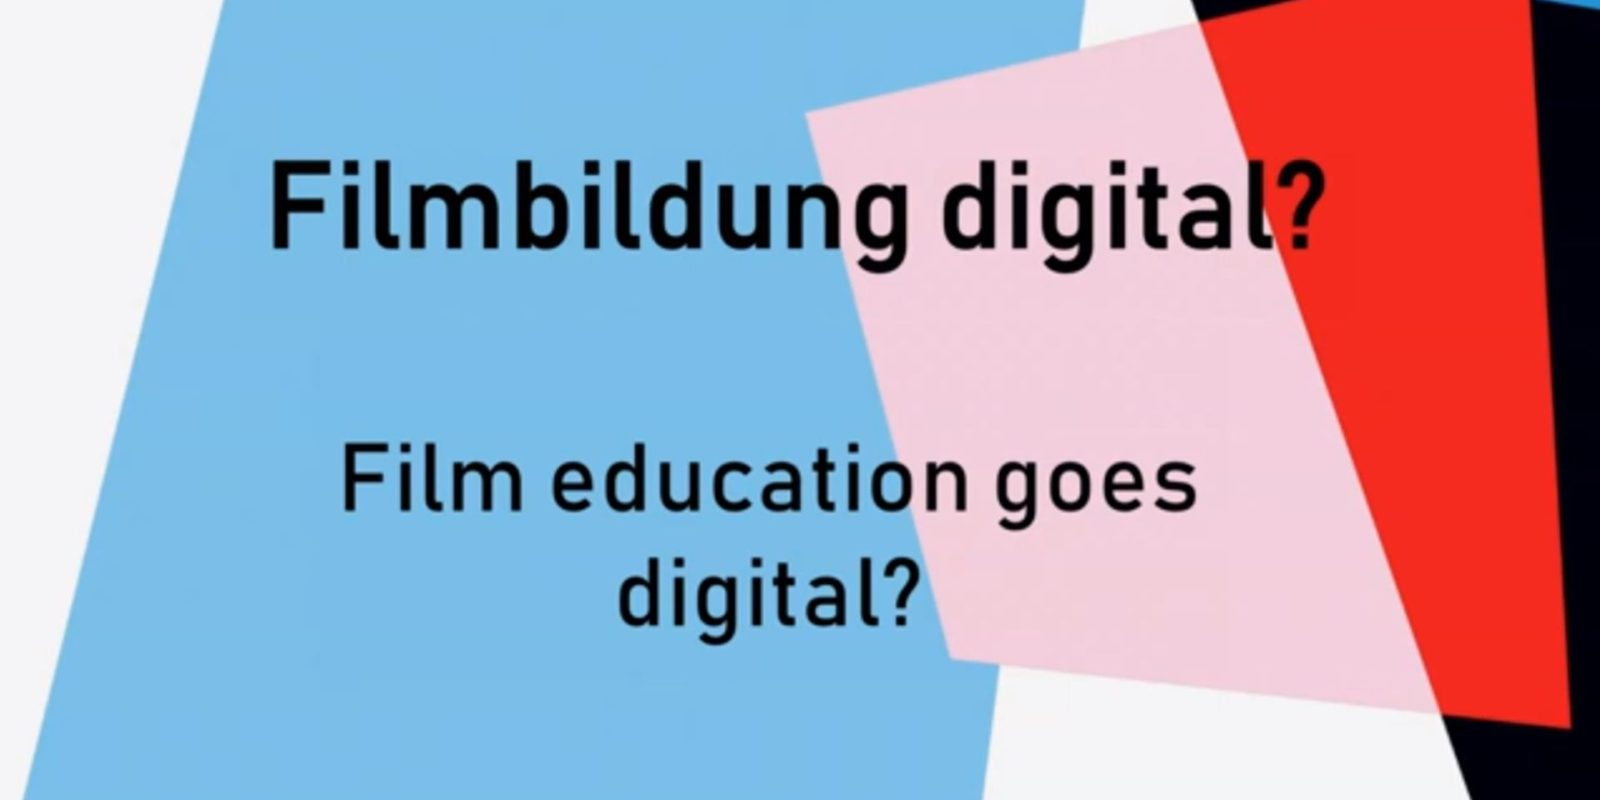 filmbildung digital